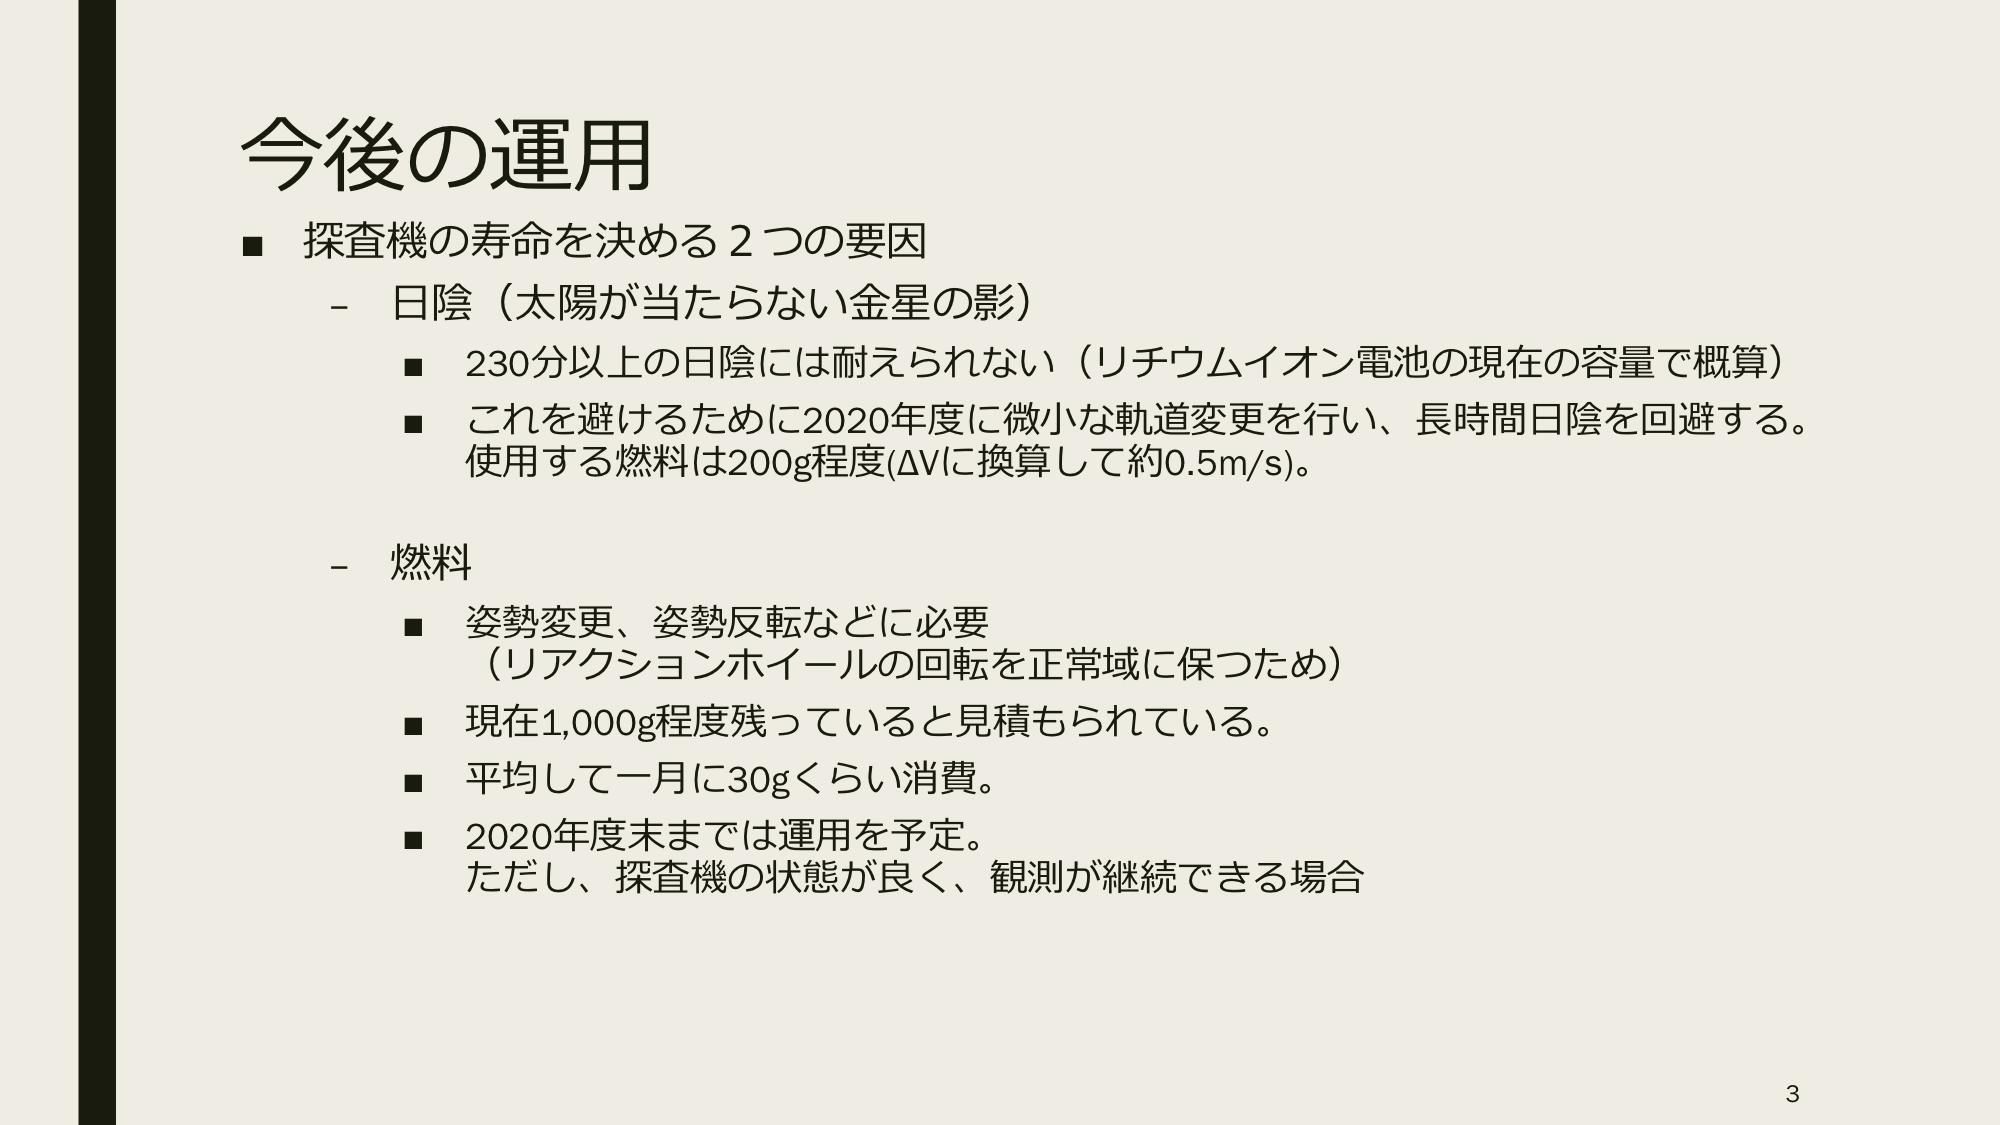 f:id:Imamura:20191119205318p:plain